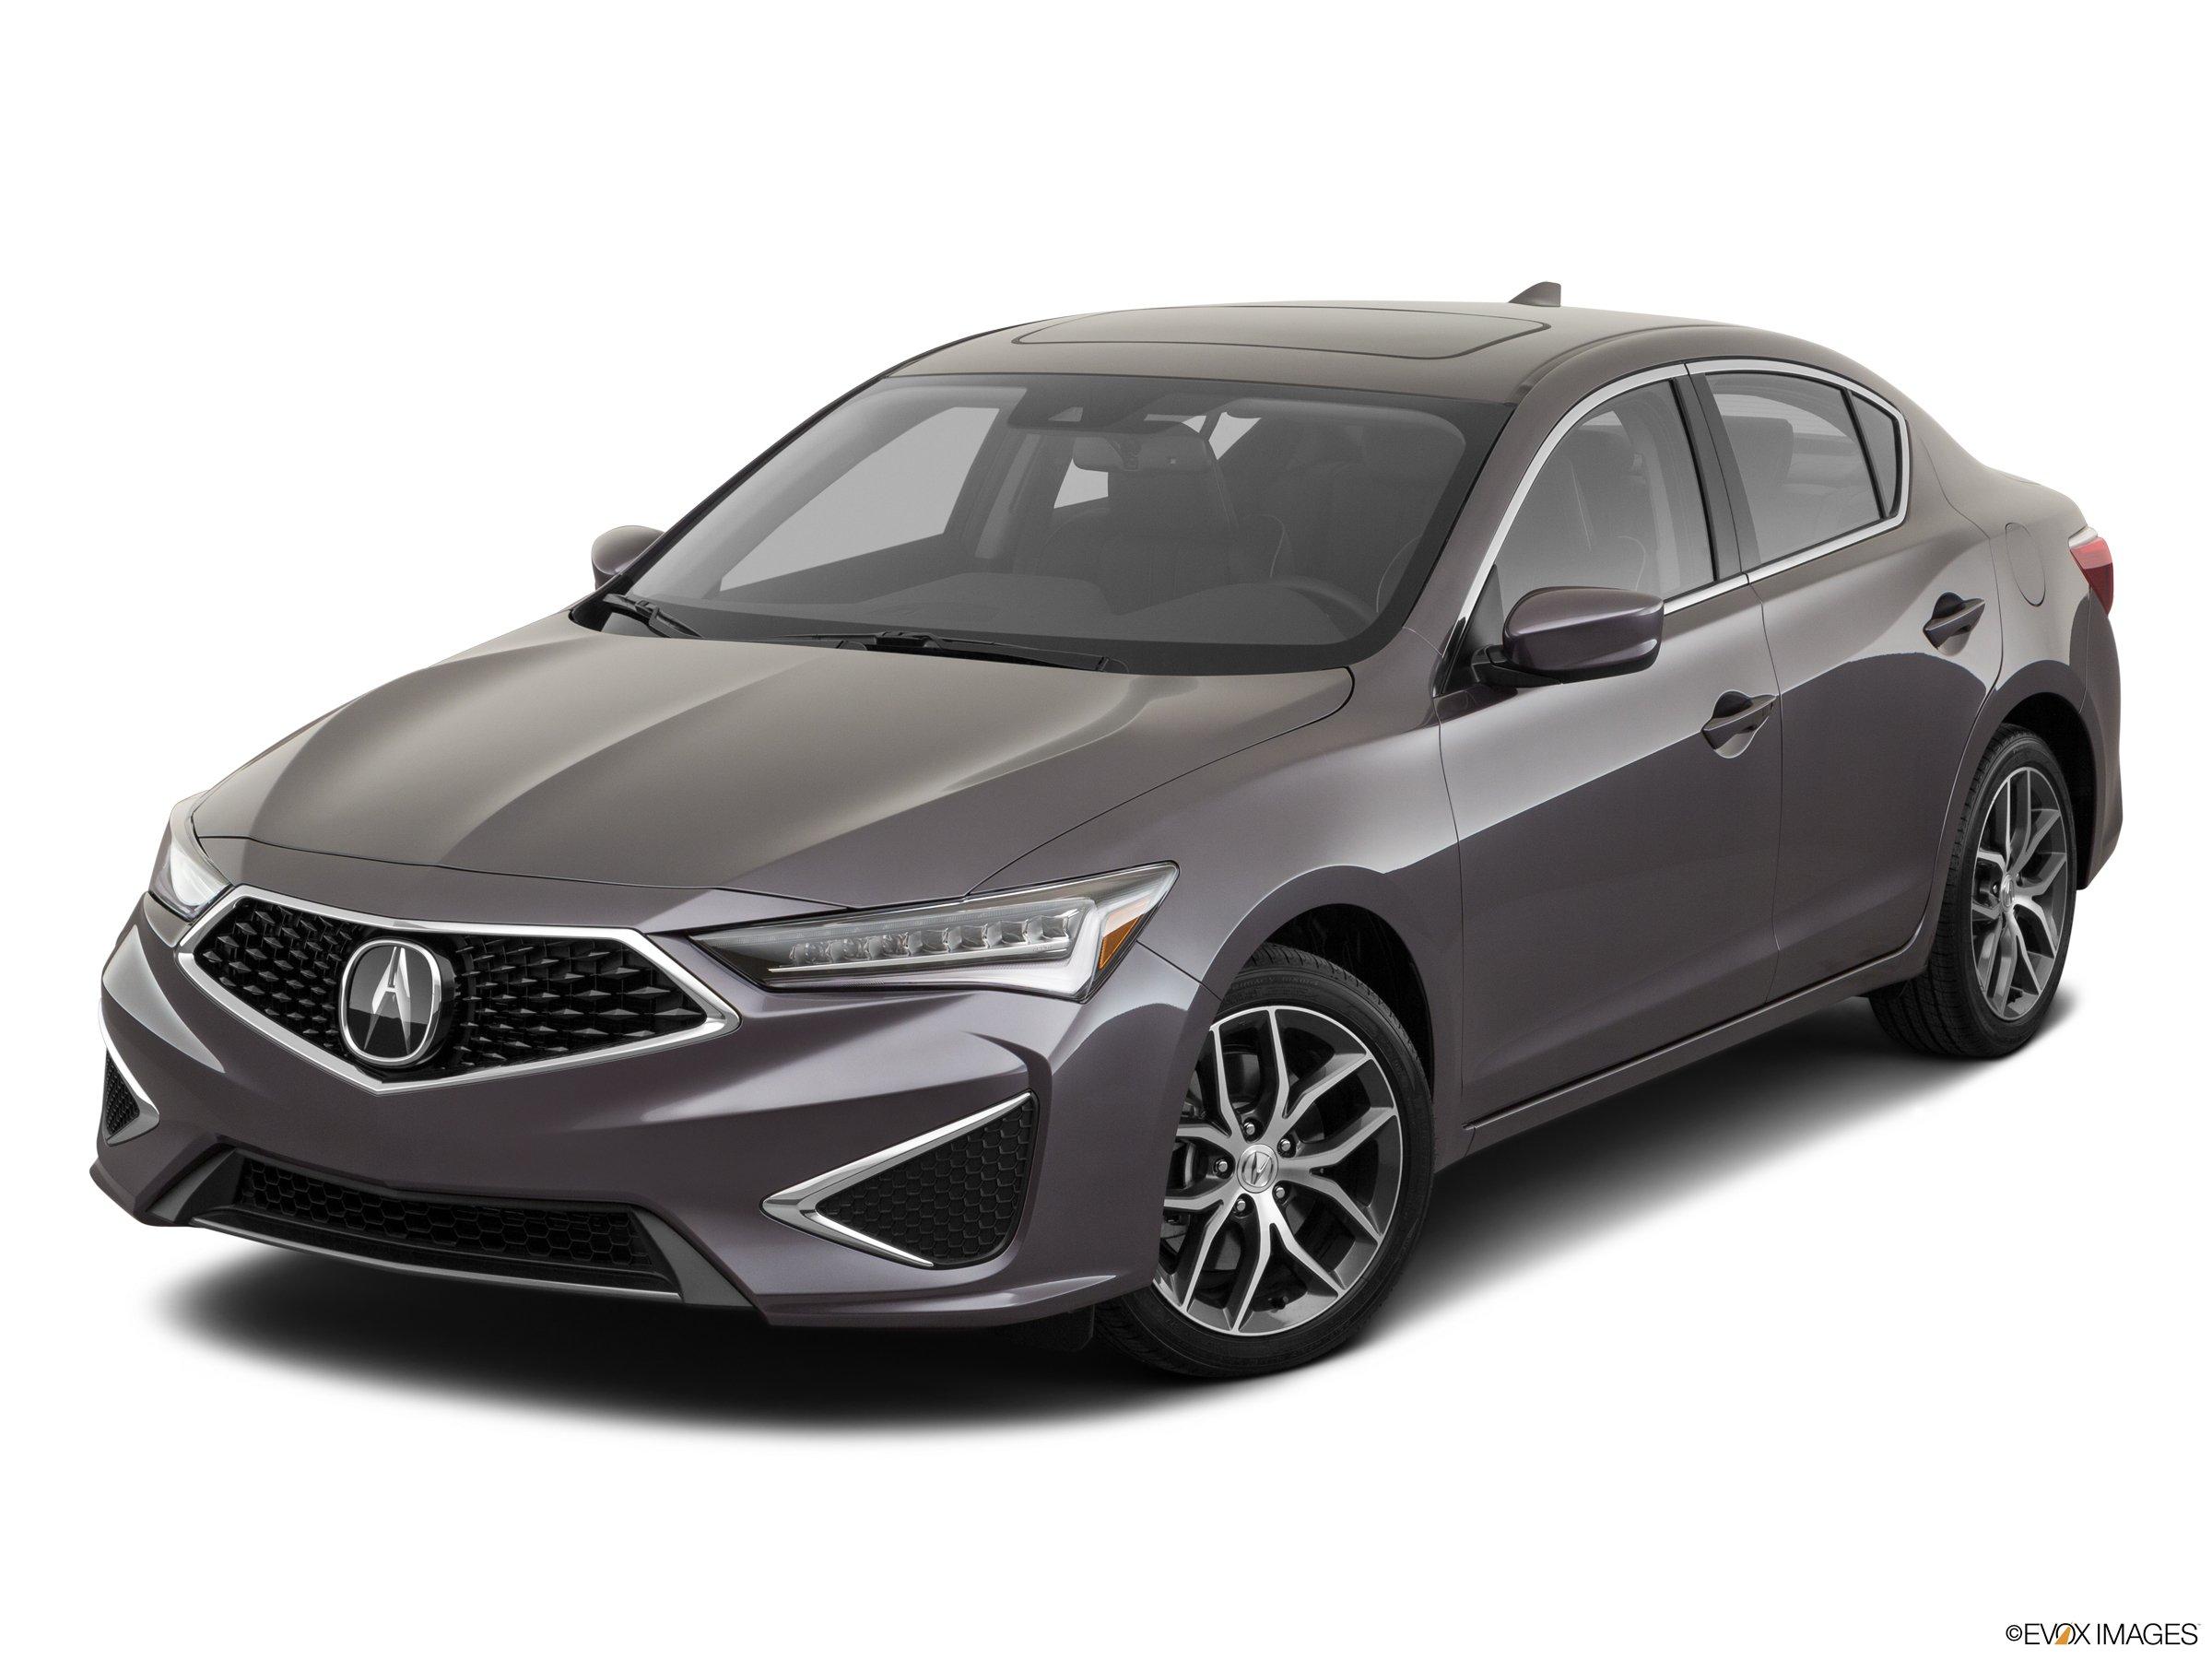 2020 Acura ILX with Premium Package FWD sedan